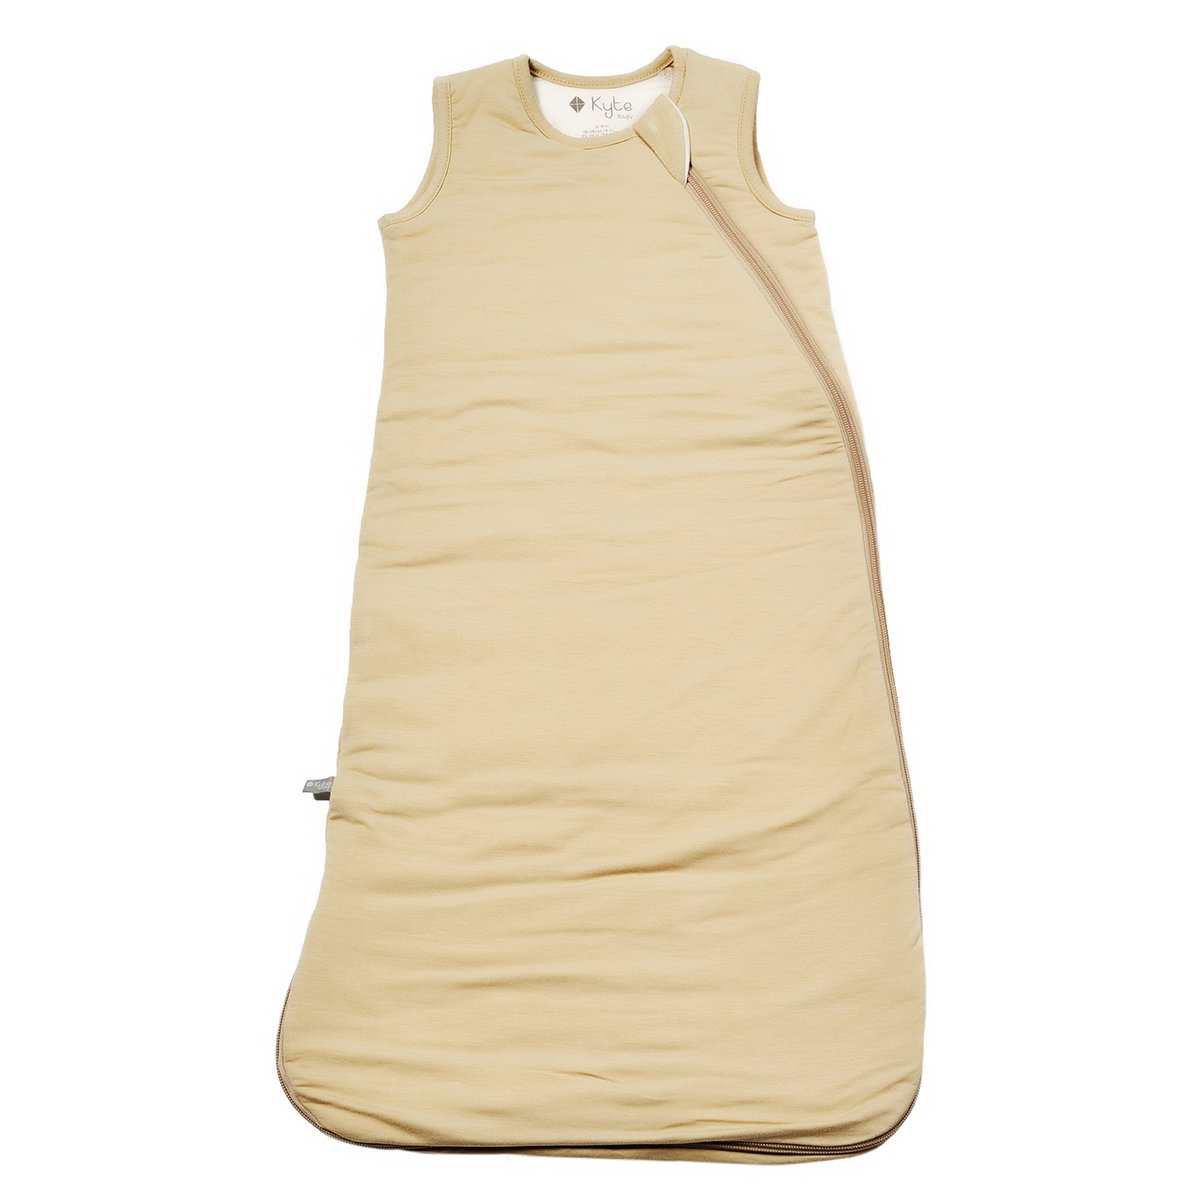 Kyte BABY Unisex Baby Solid Sleep Bag 1.0 tog 6-18 Months Petal